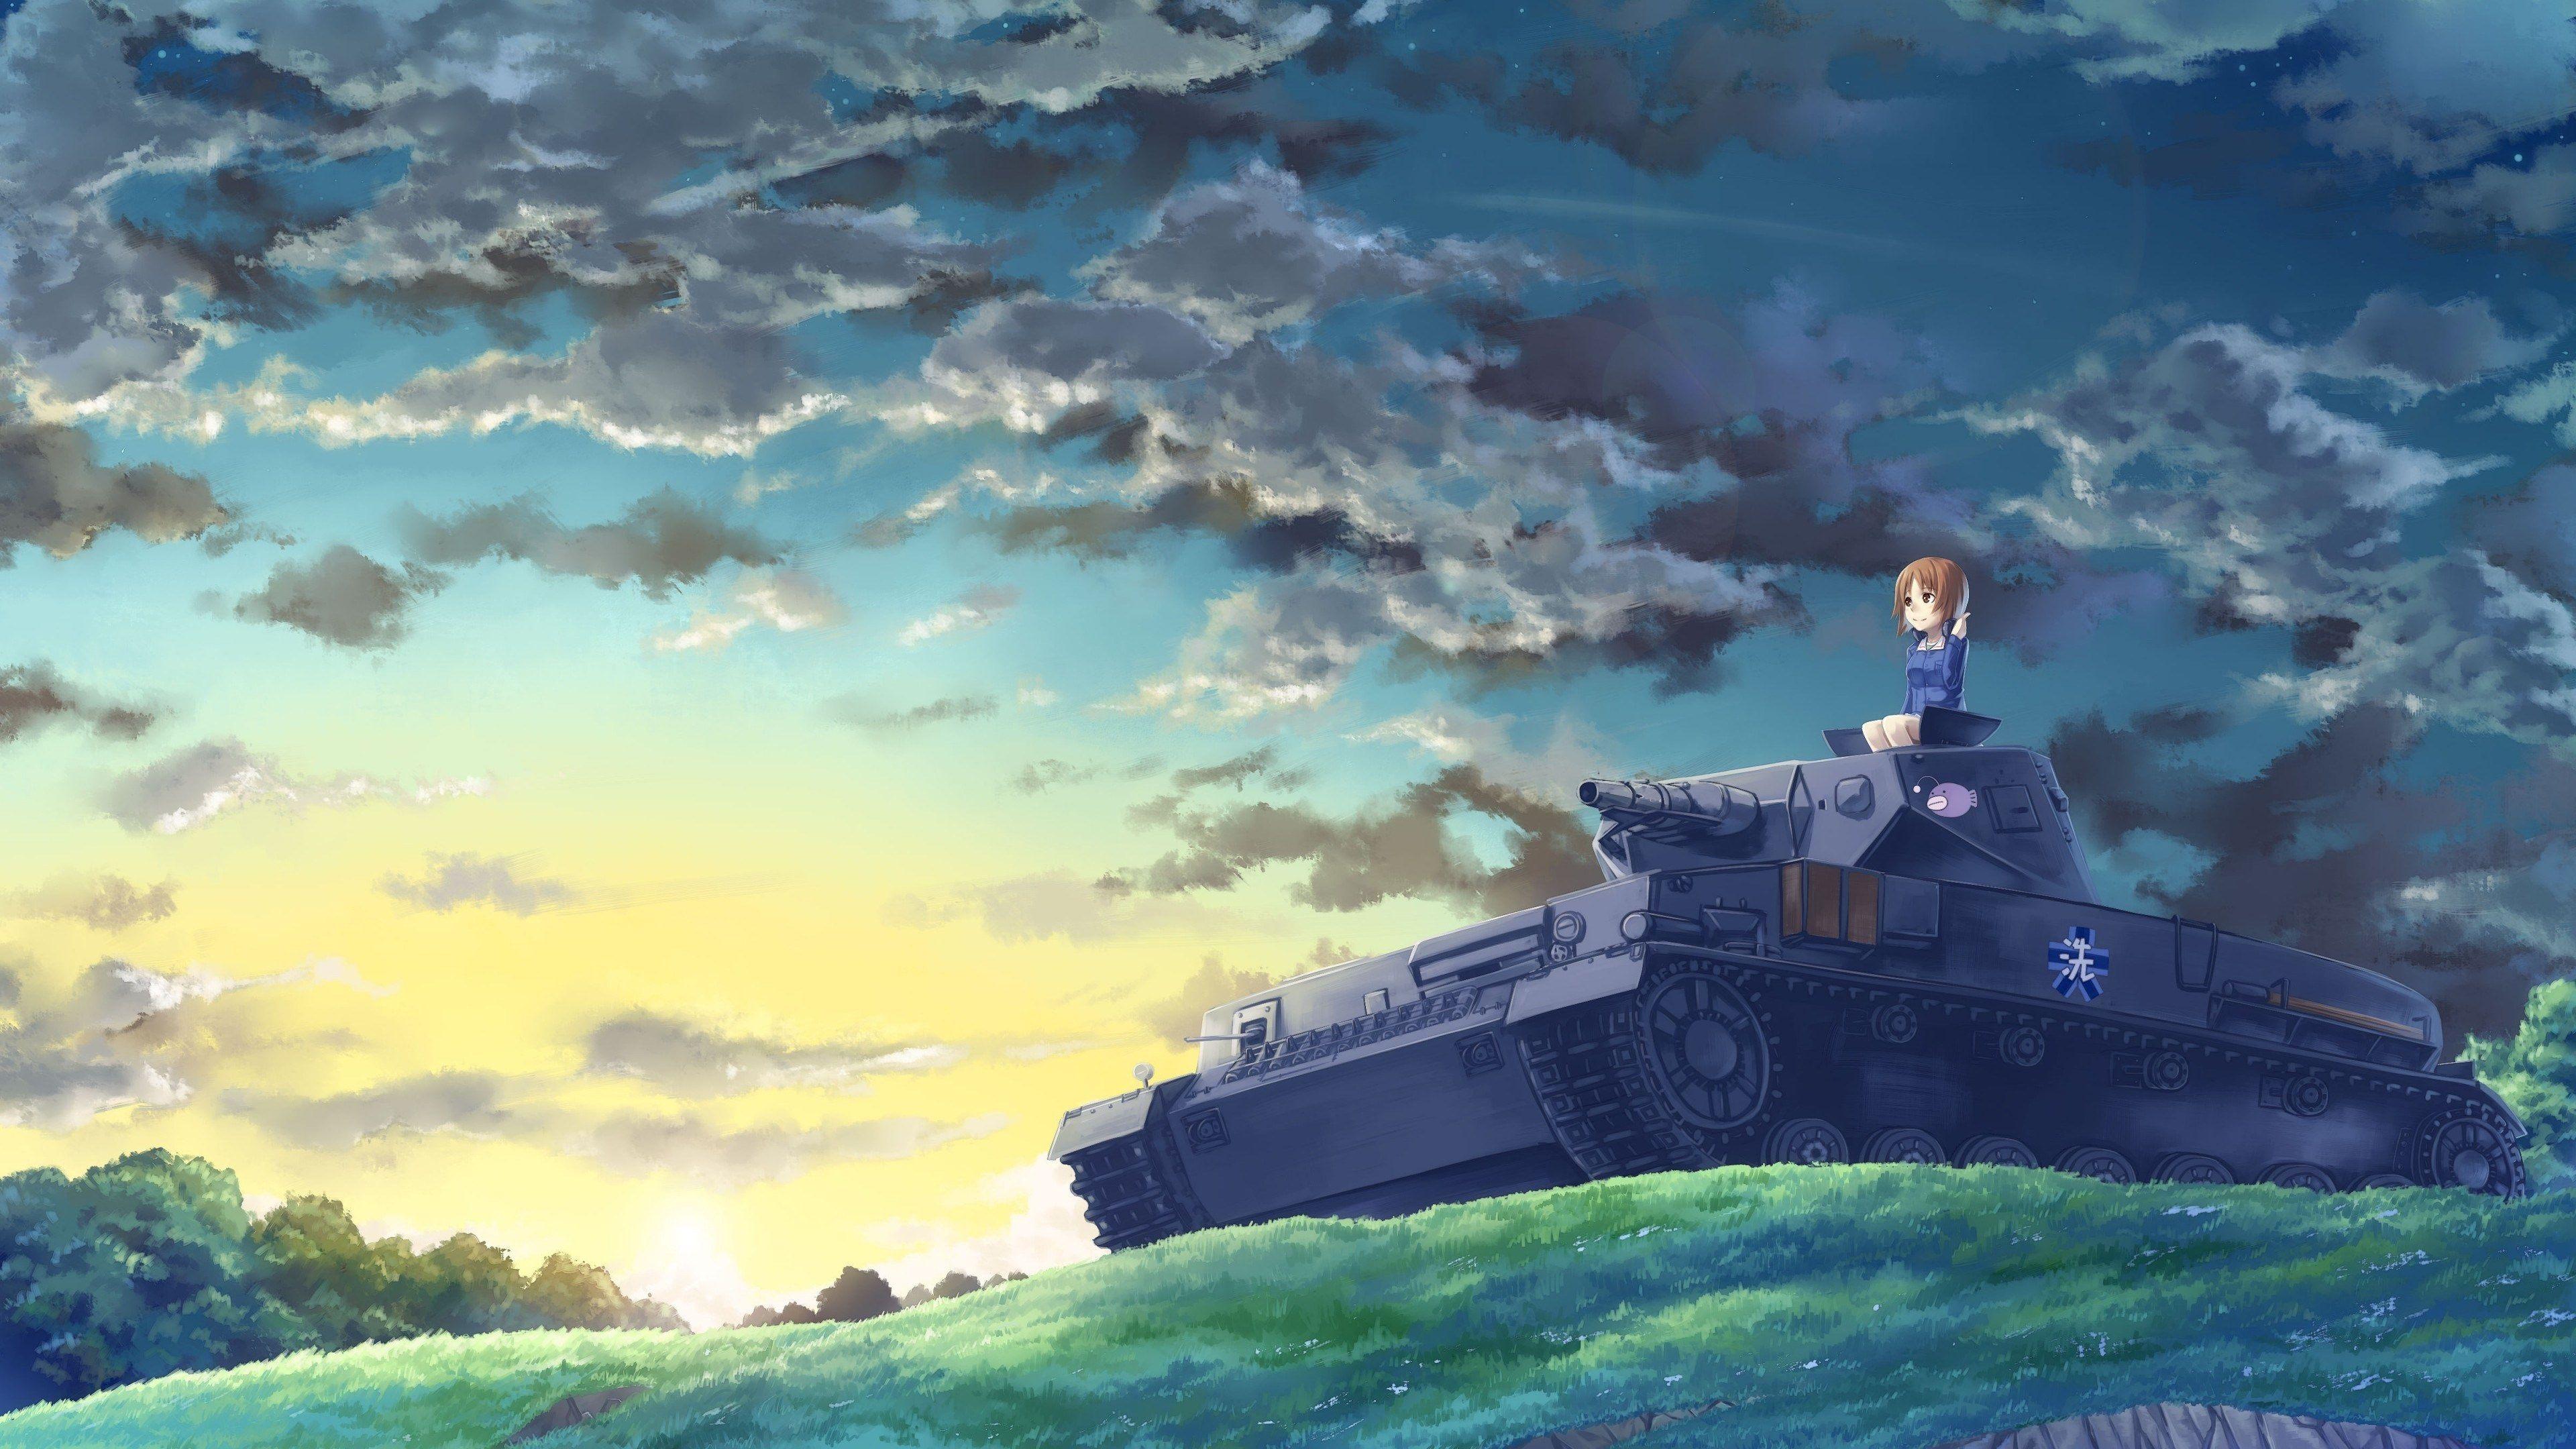 3840x2160 Anime 4k Best Photos For Wallpaper Hd Anime Wallpapers Anime Wallpaper Background Images Wallpapers